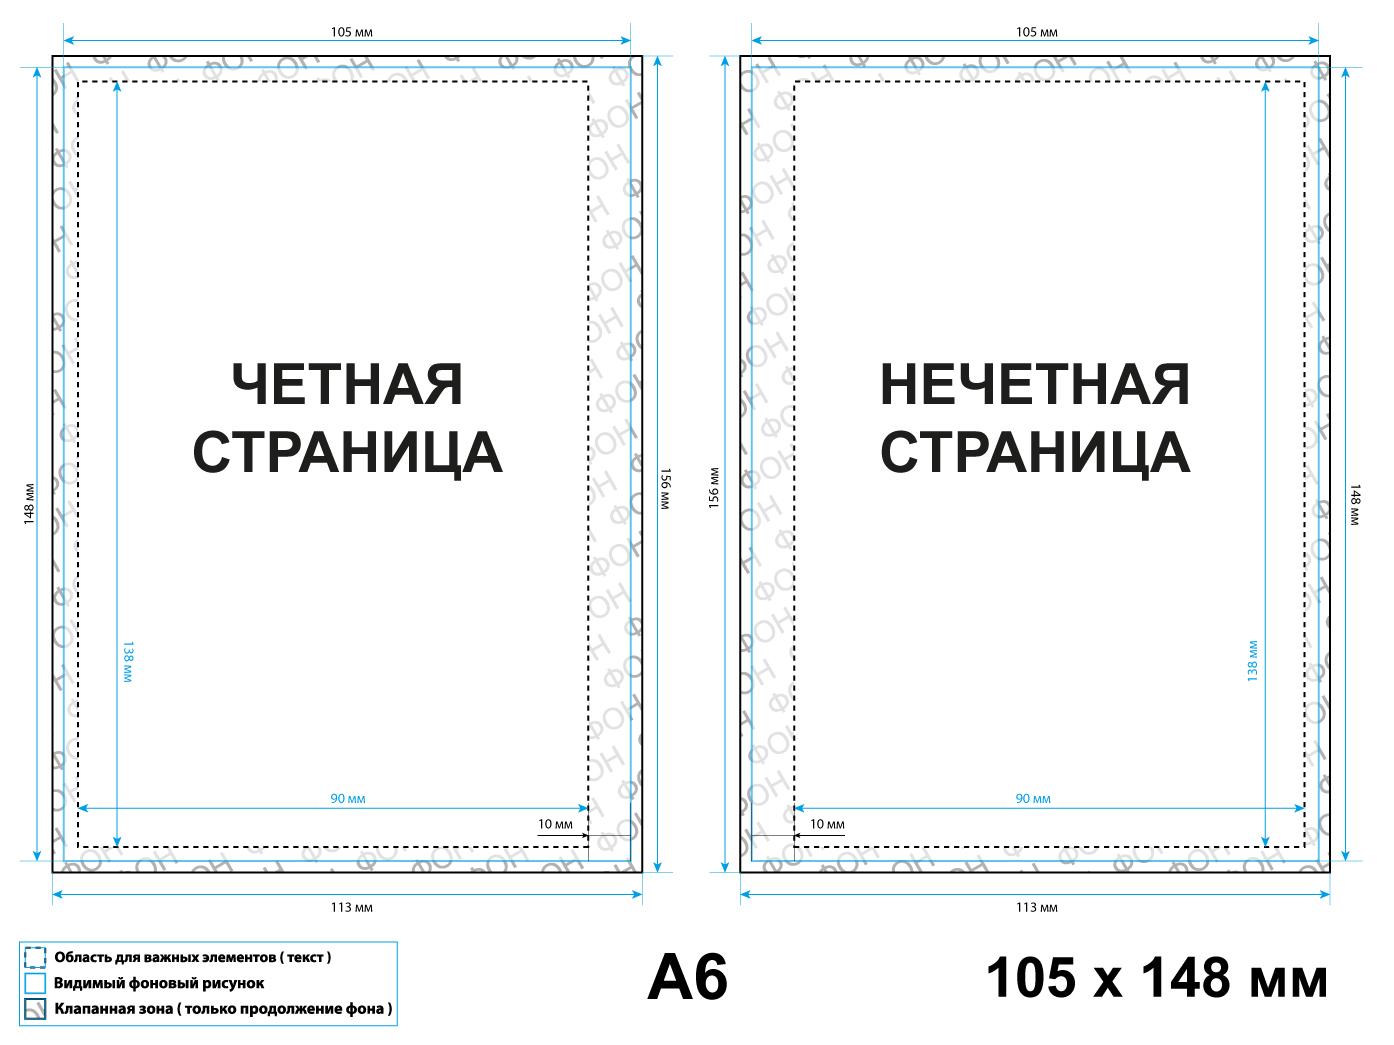 страницы брошюры формата А6